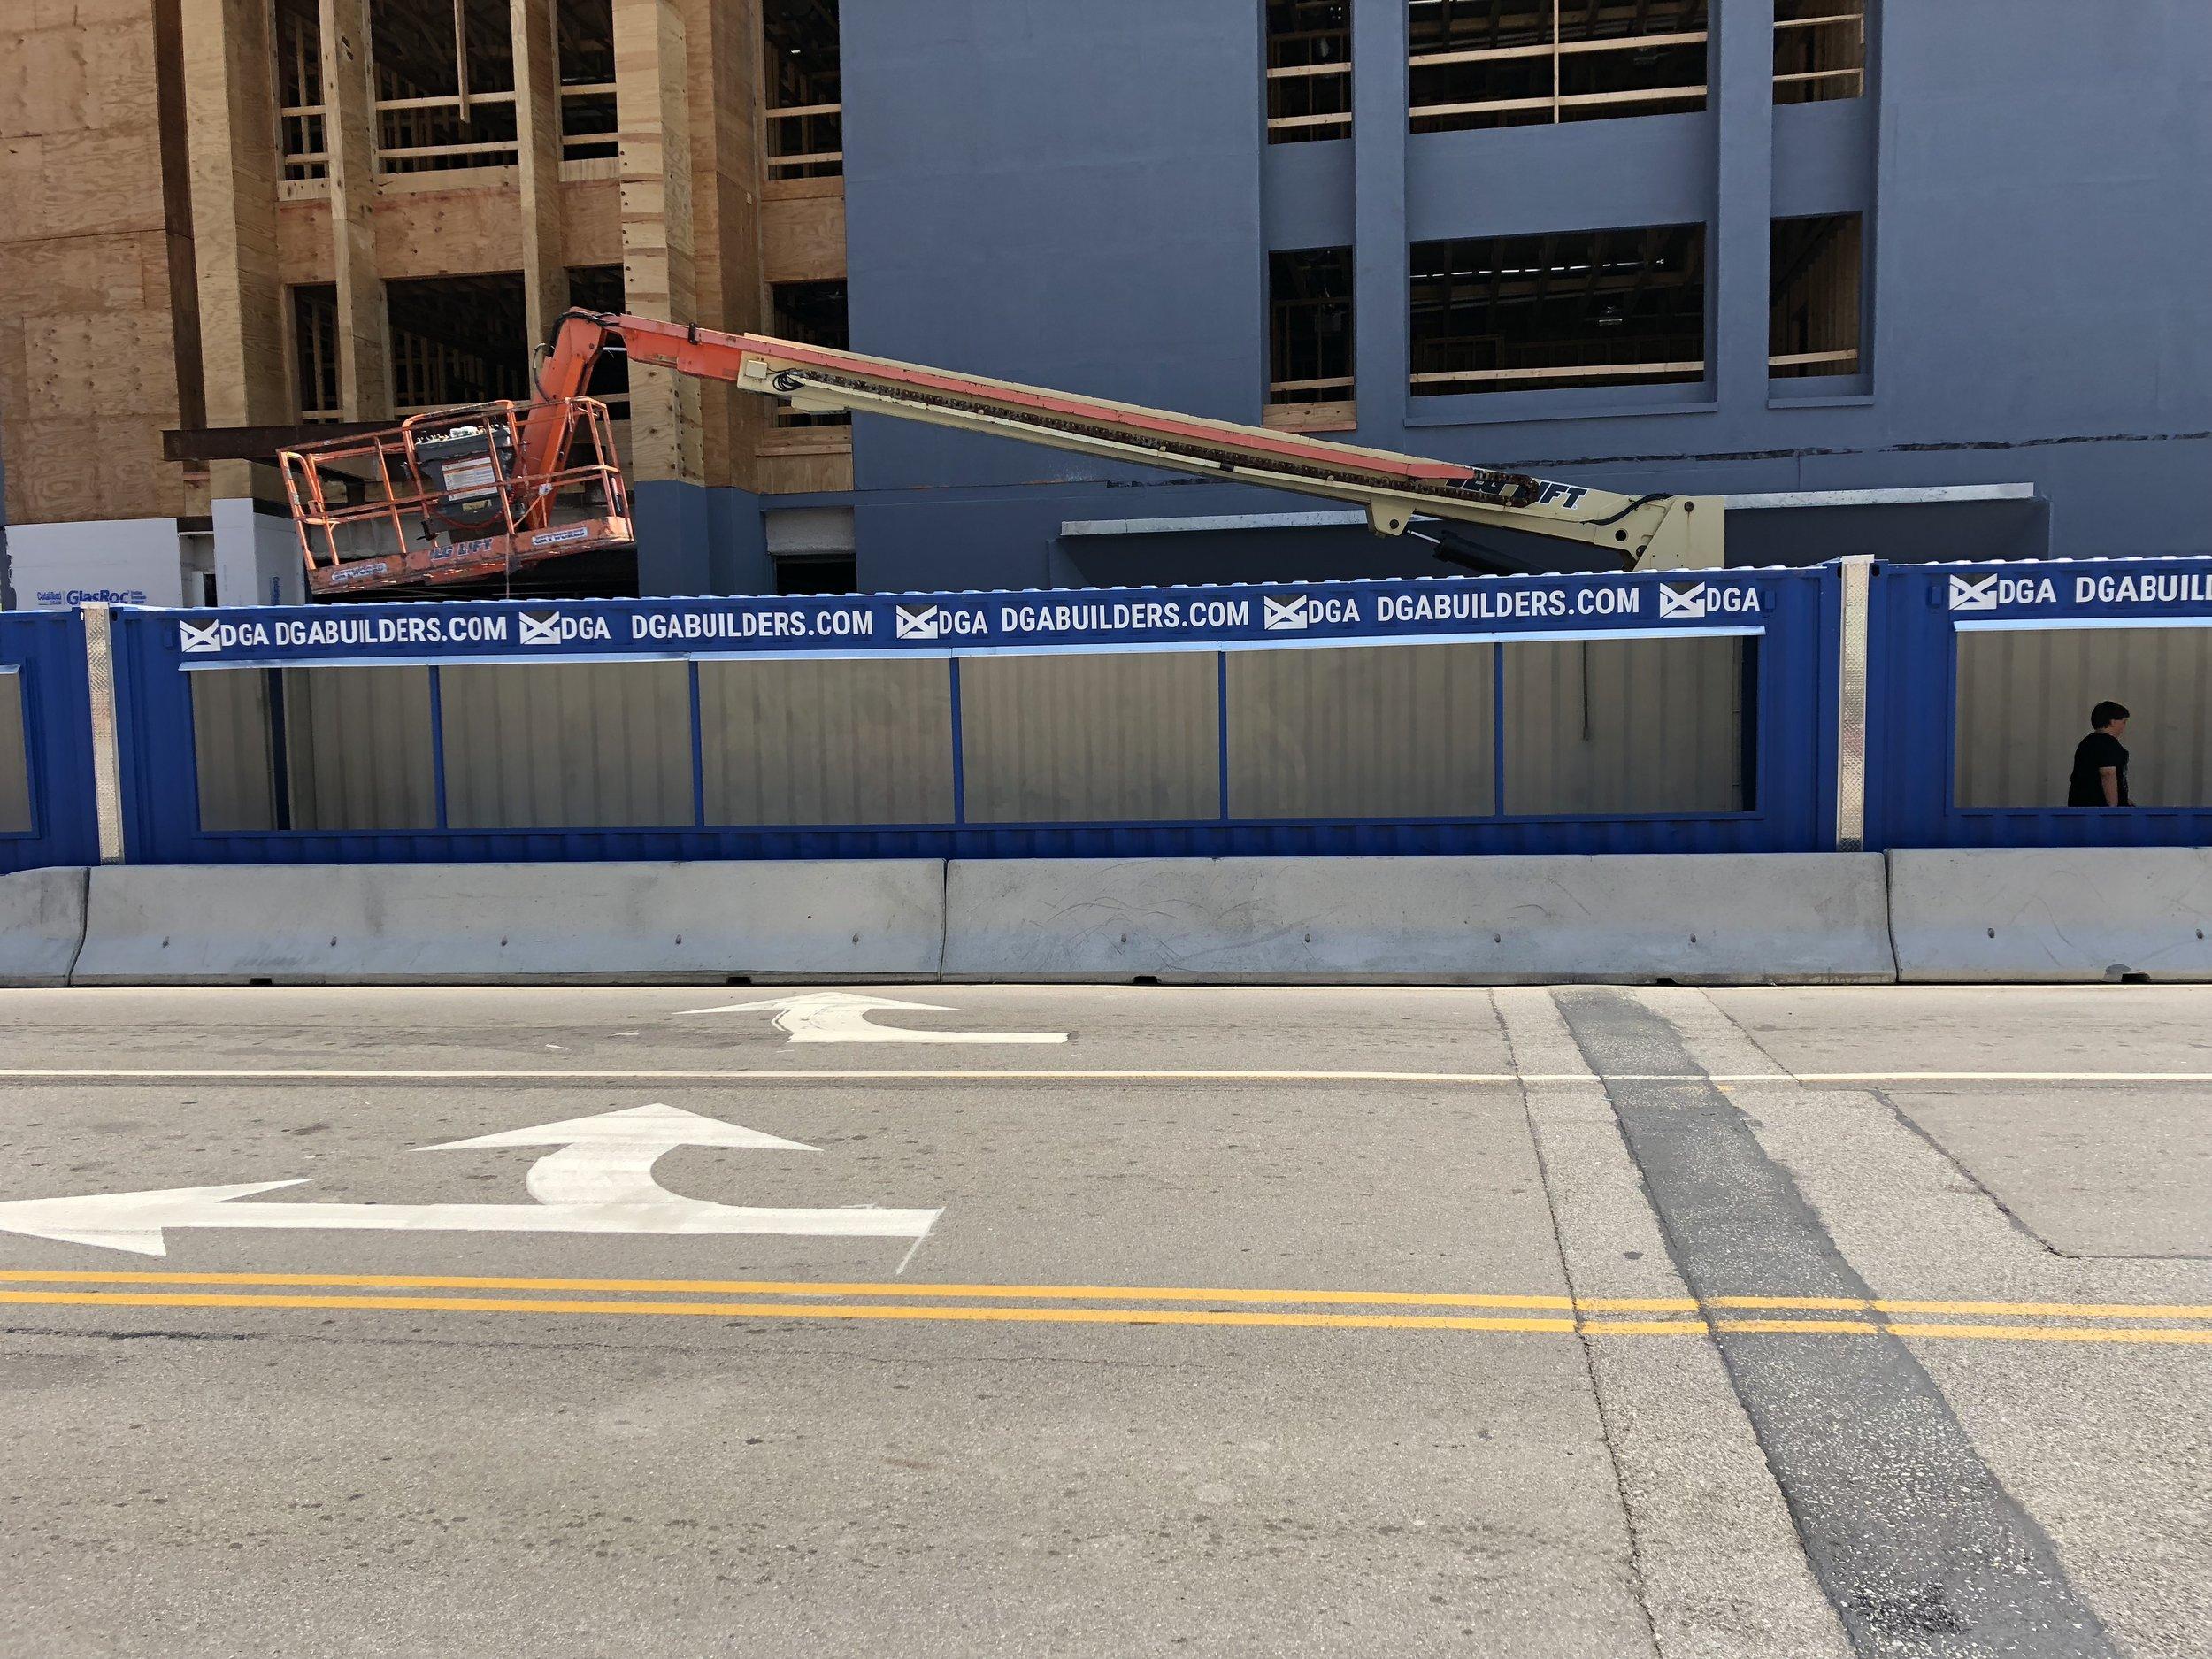 Custom Signage for DGA's Construction site next to Dinosaur BBQ